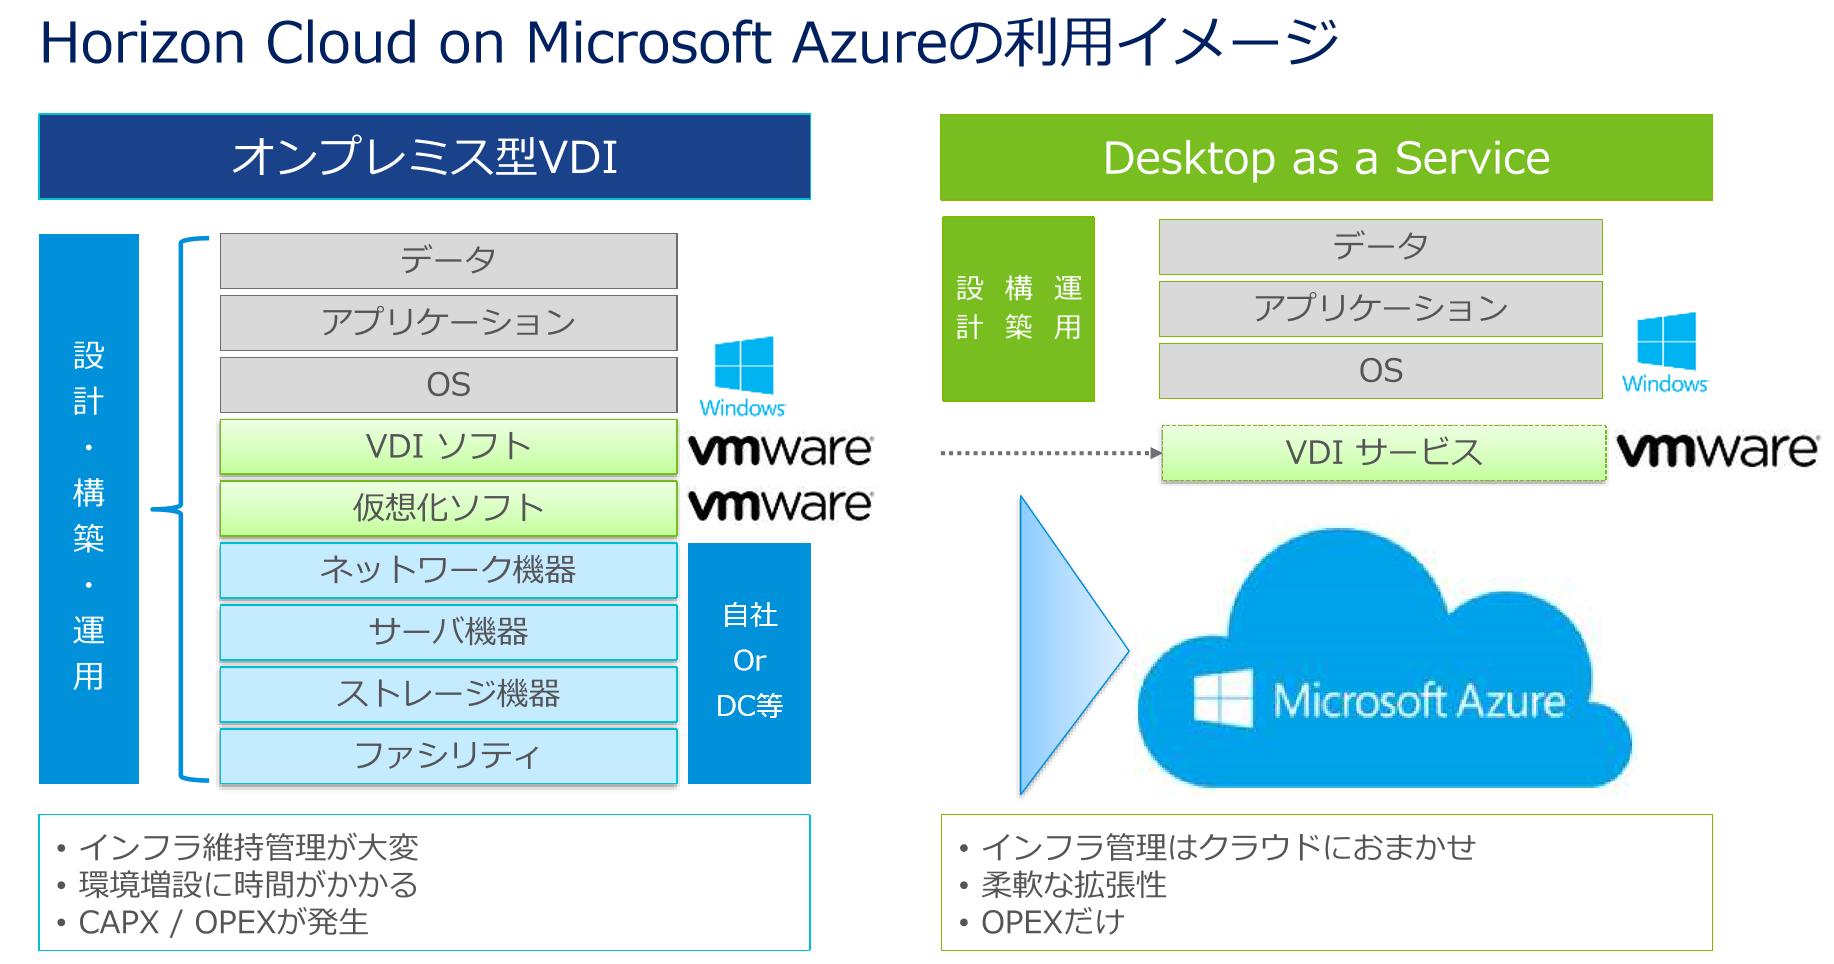 Horizon Cloud on Microsoft Azureの利用イメージ